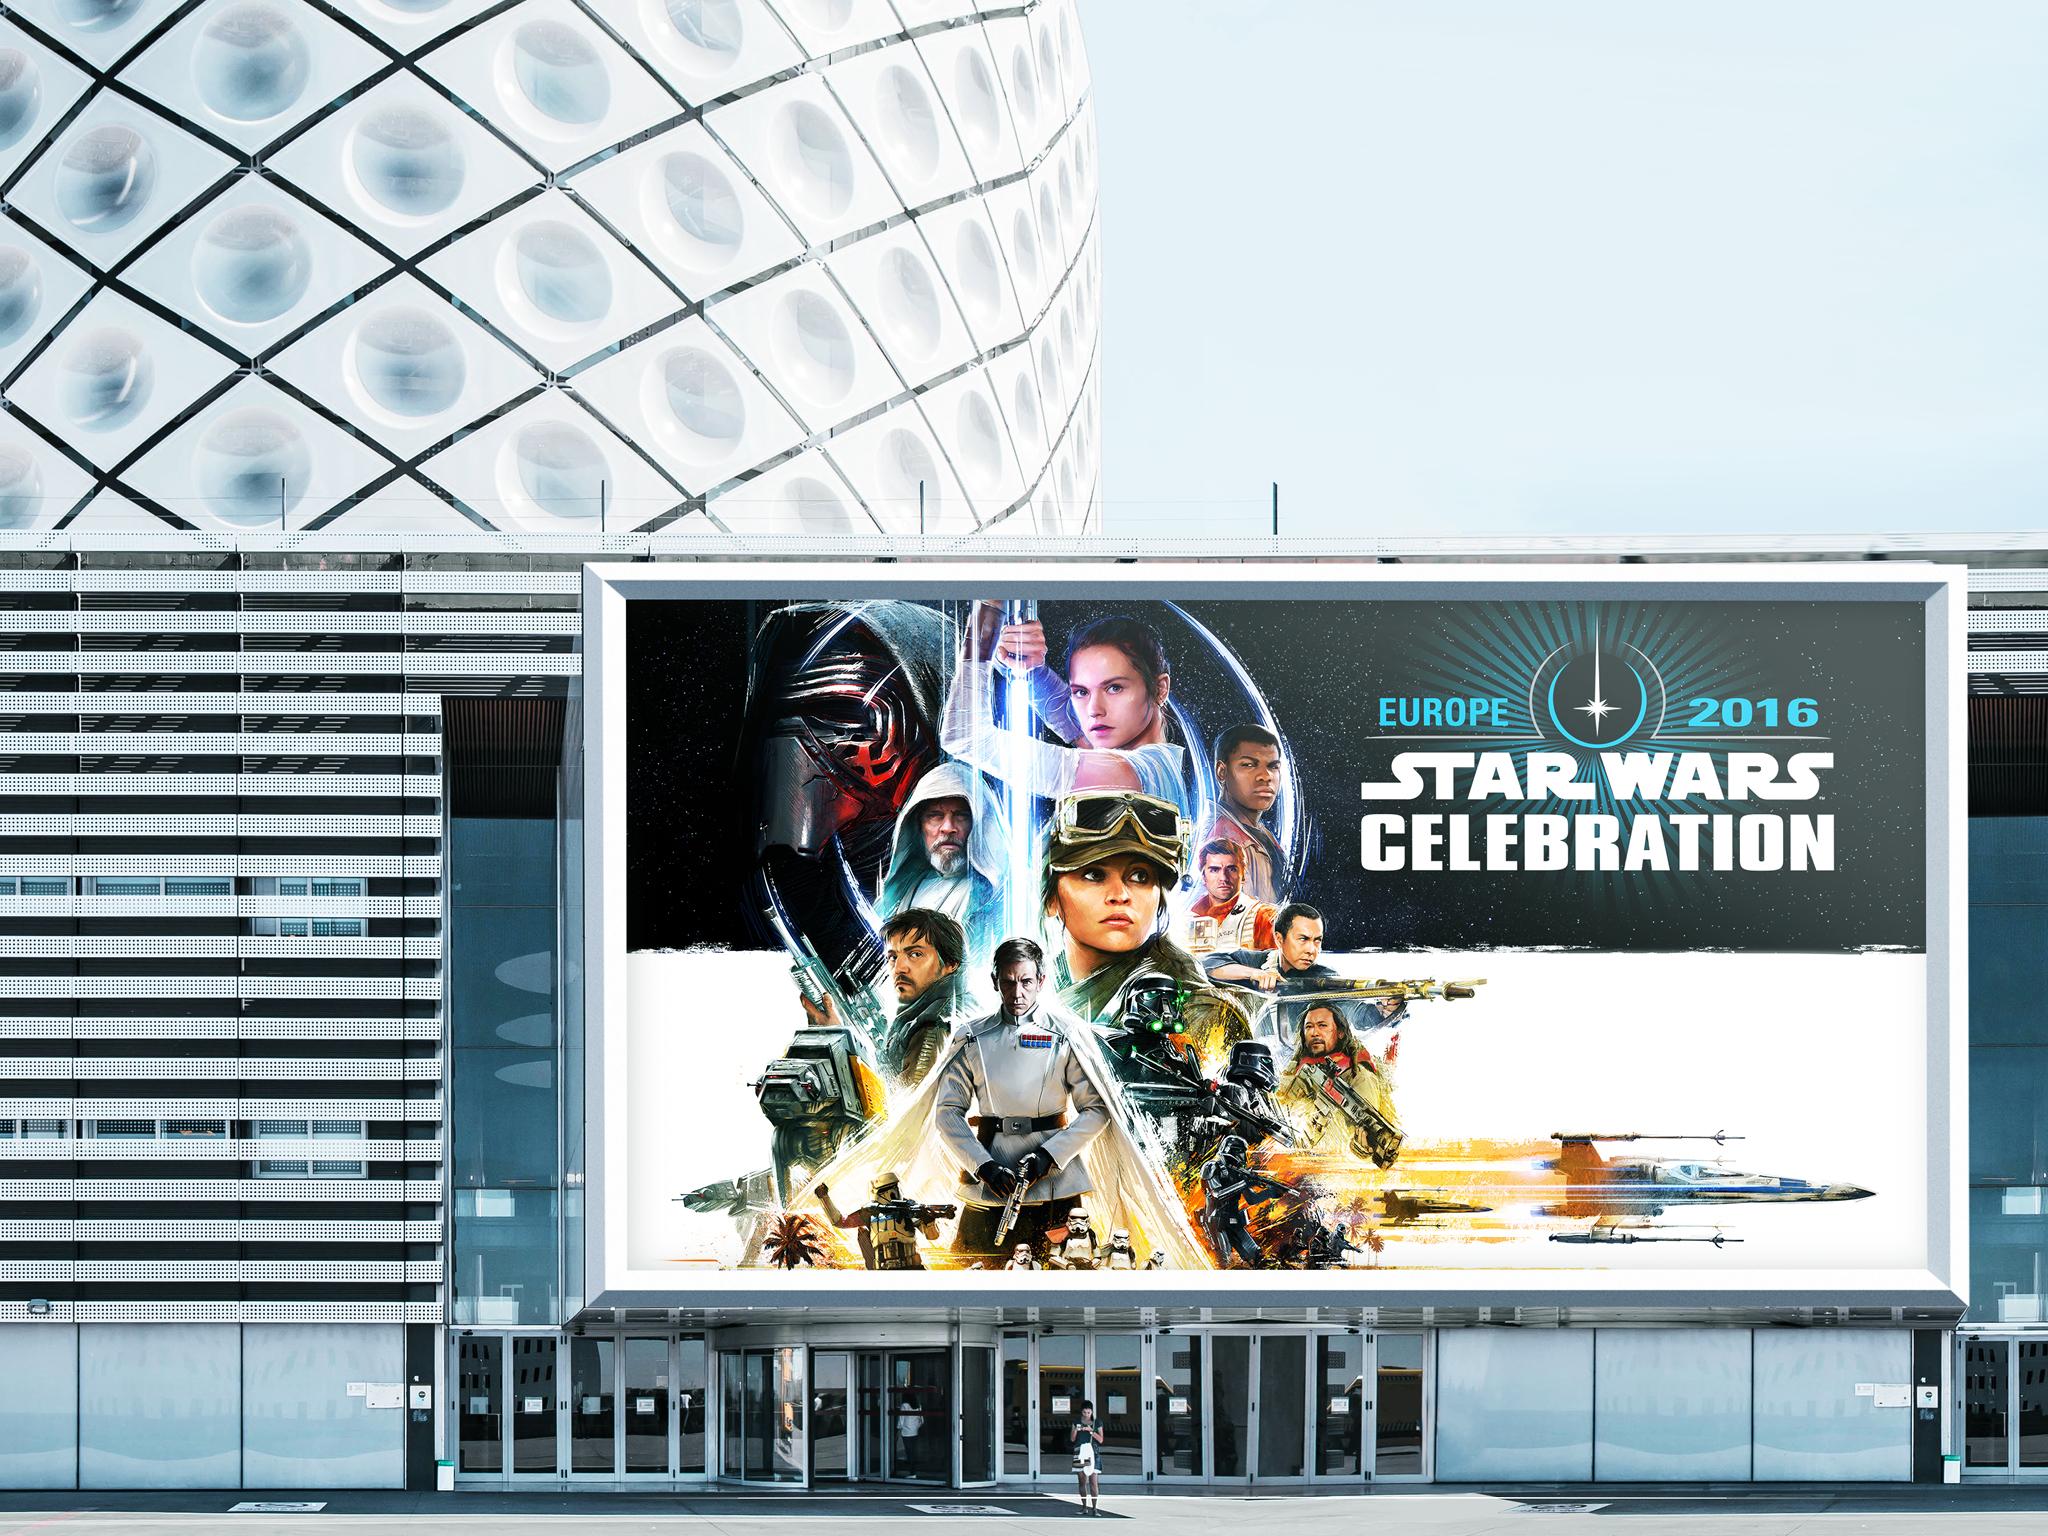 PLT_Star_Wars_Celebration2.jpg